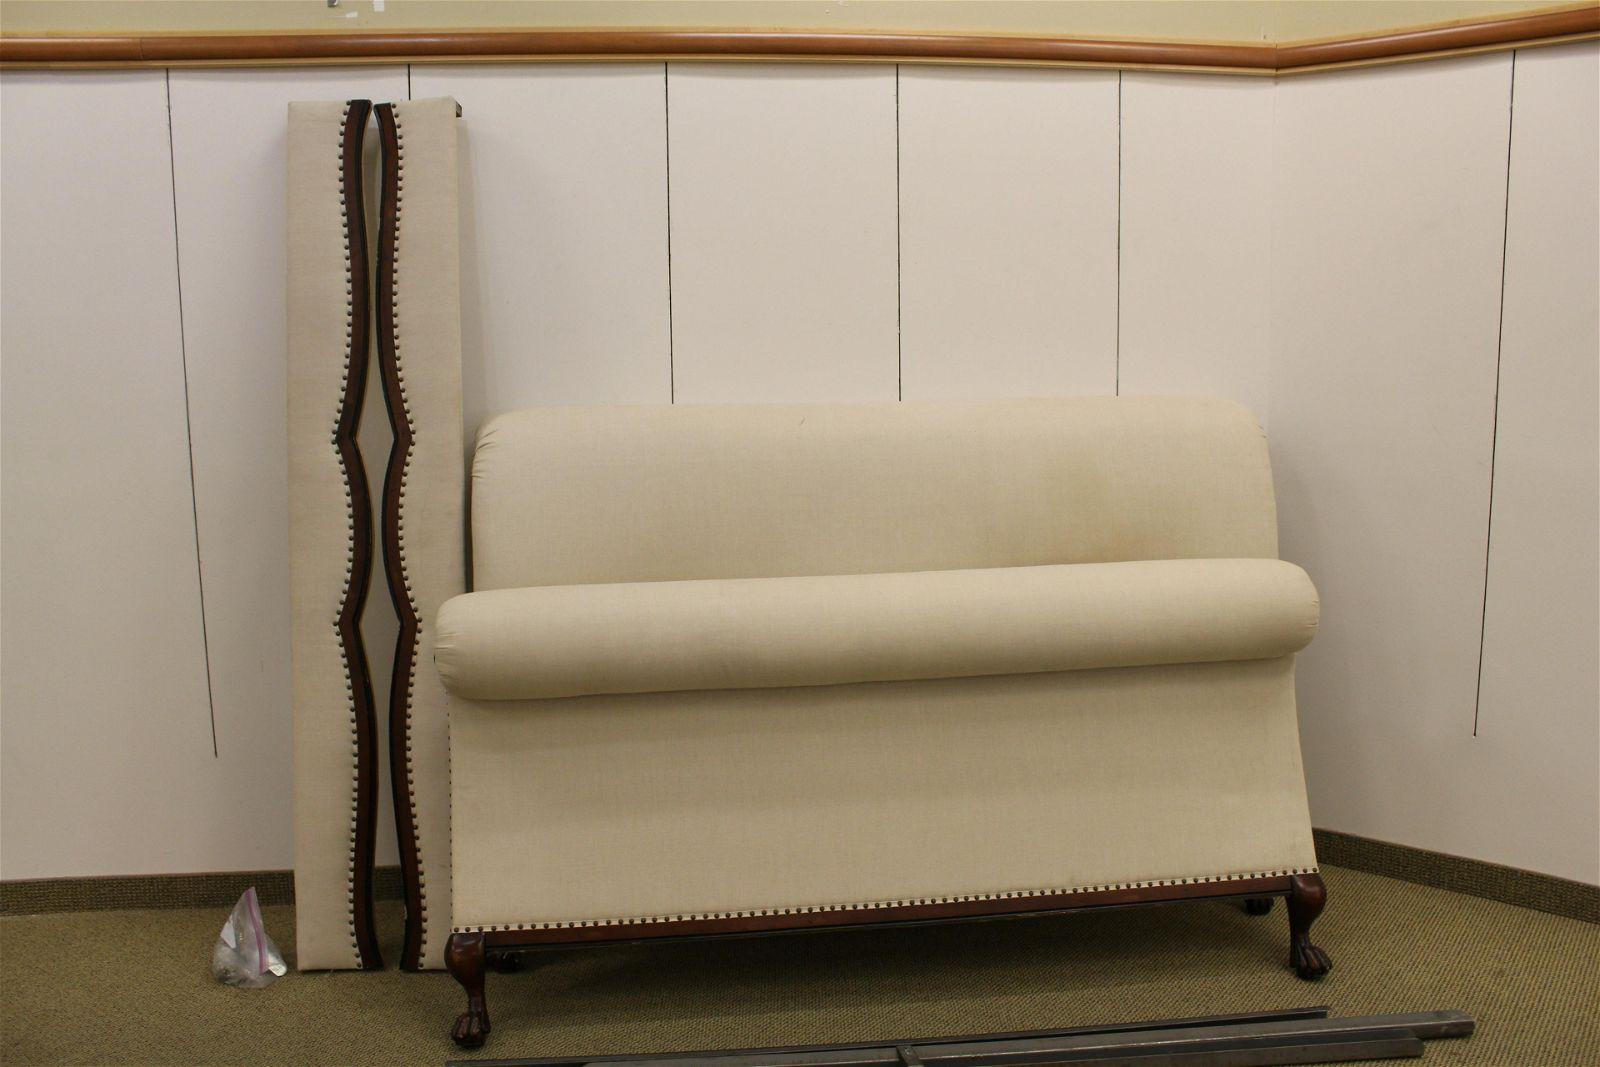 Ralph Lauren King Size Upholstered Sleigh Bed